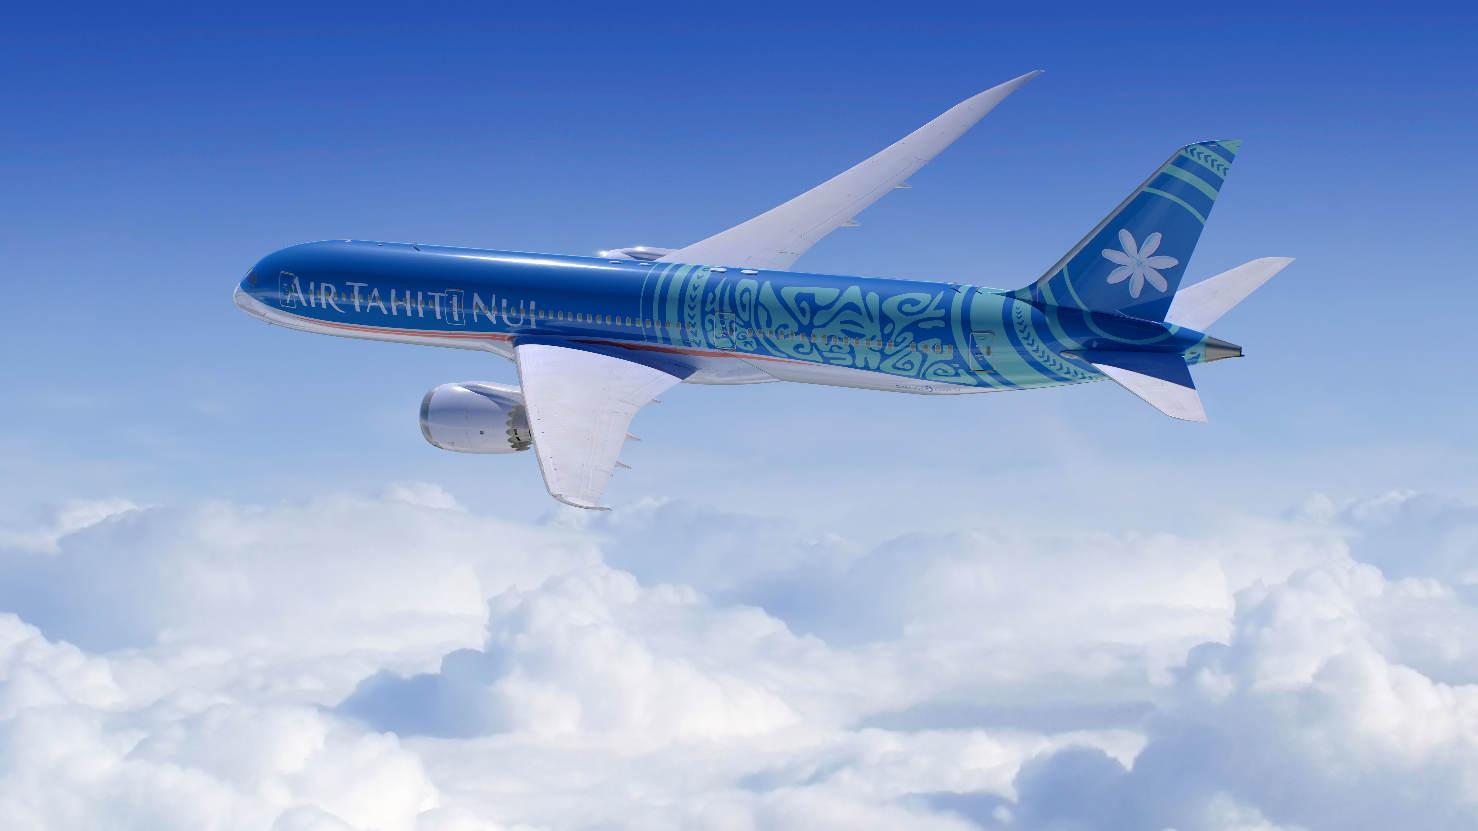 Face au low cost, Air Tahiti Nui joue la carte du service